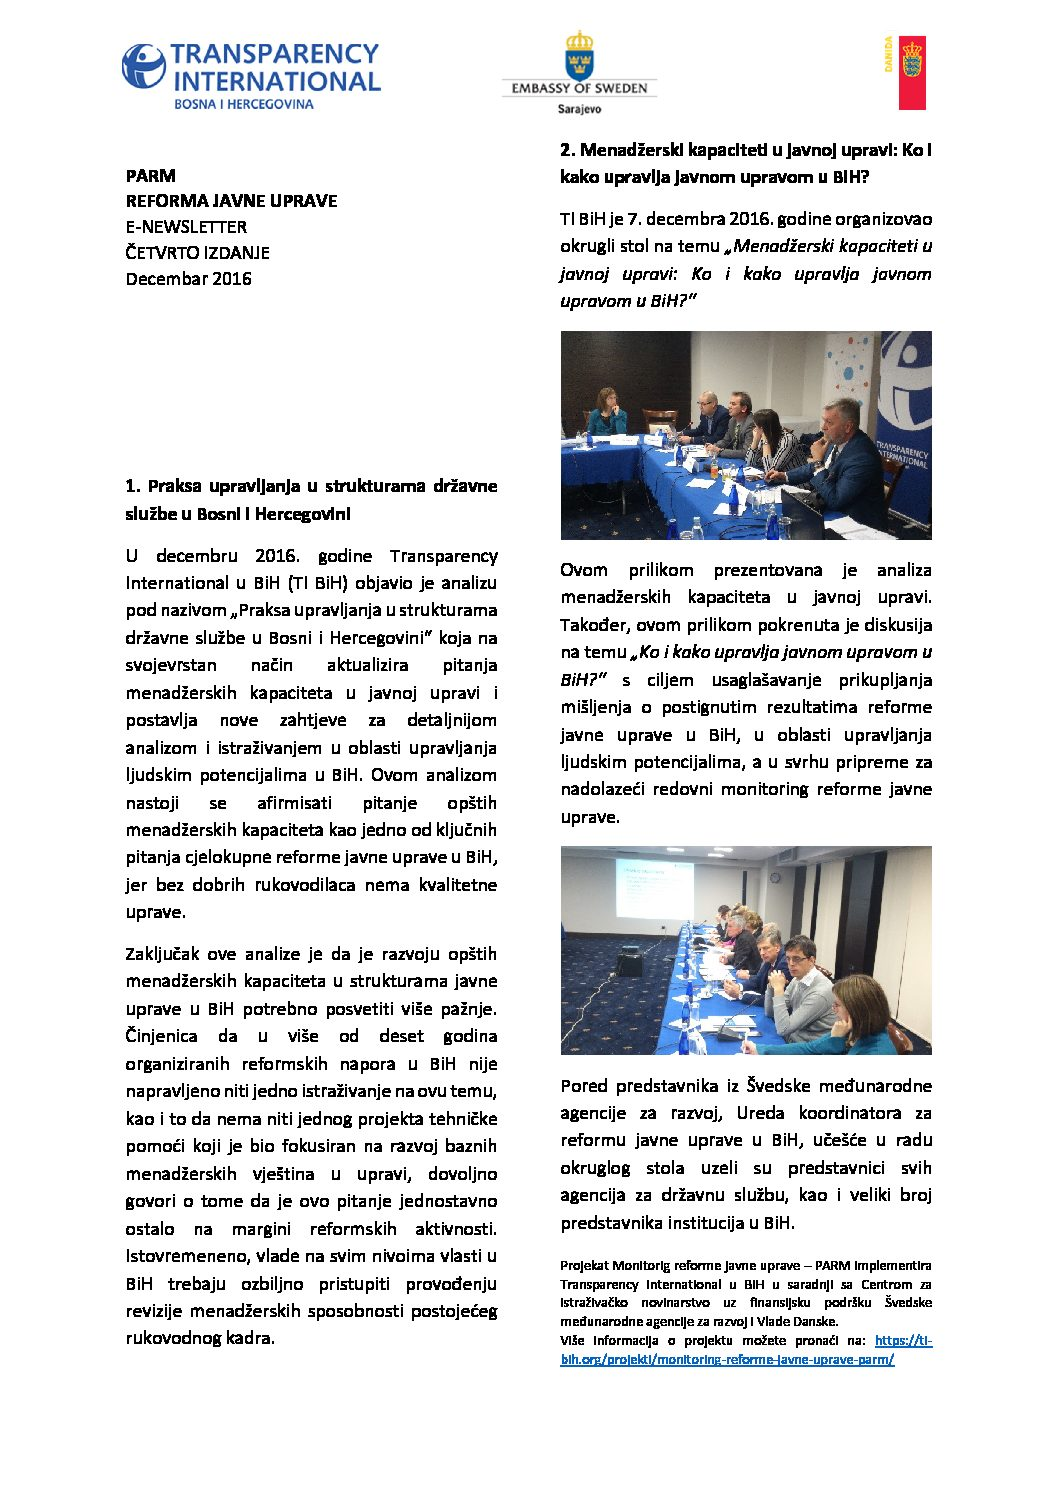 PARM Newsletter IV